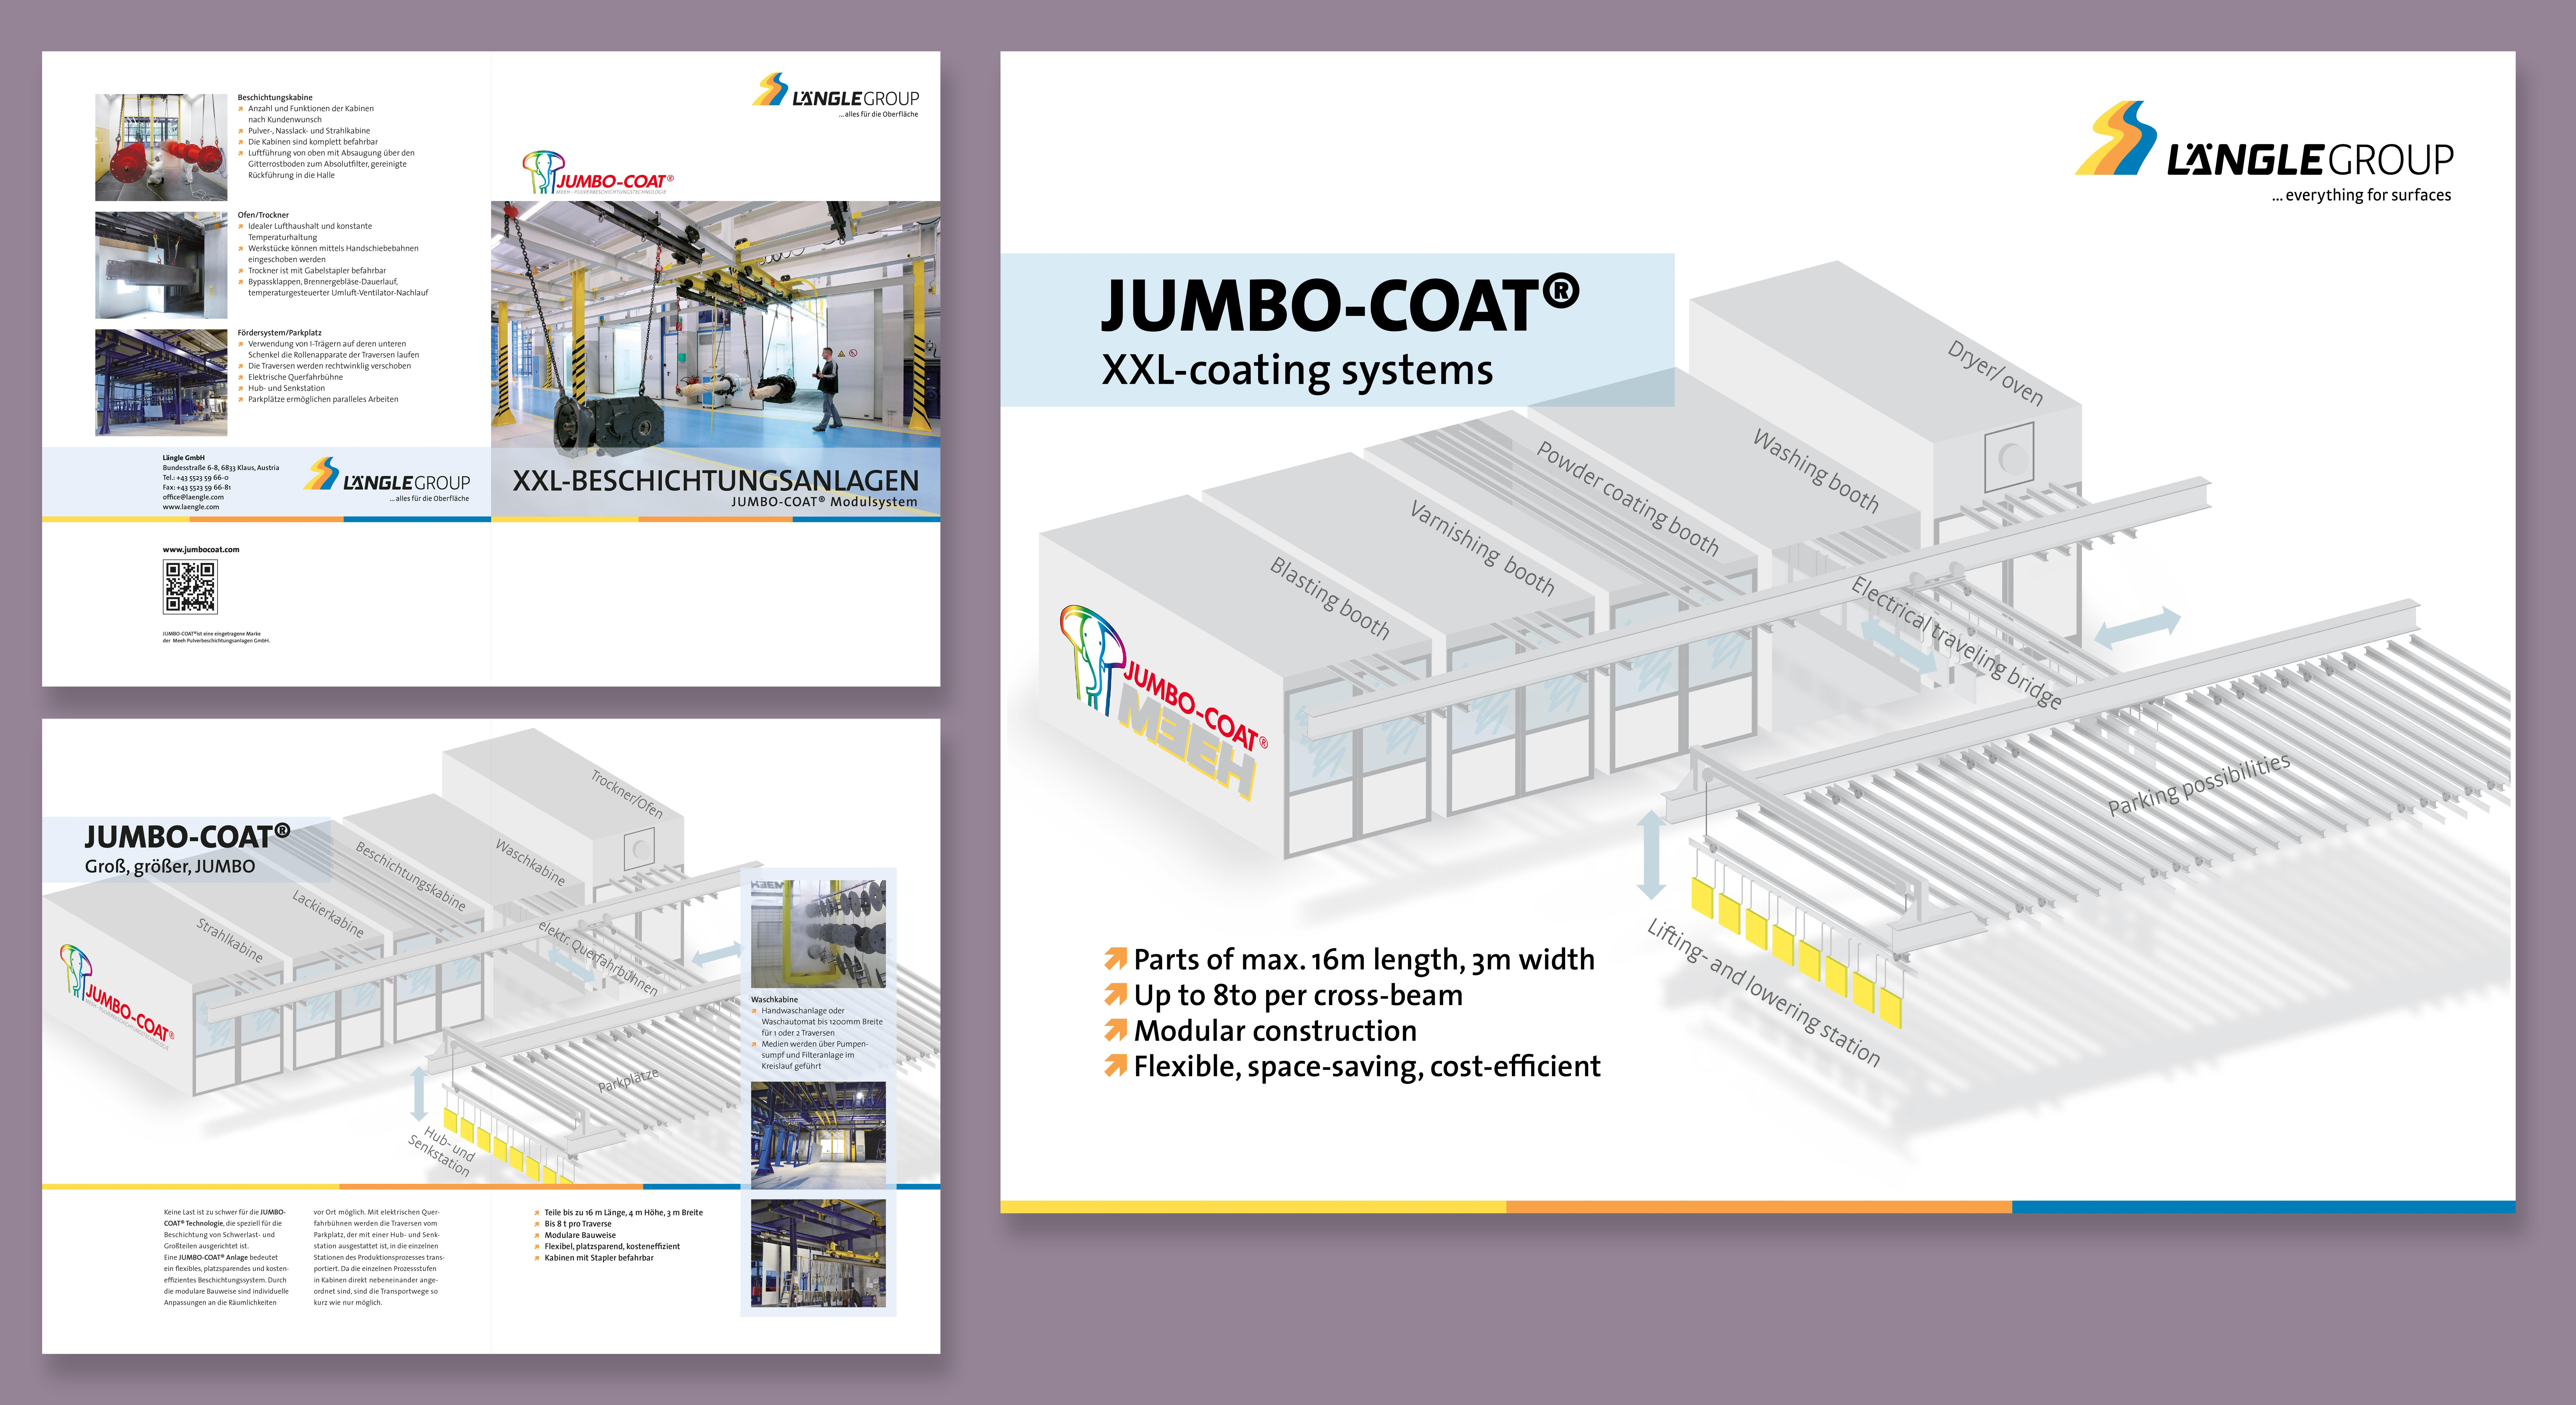 Messe_JumboCoat